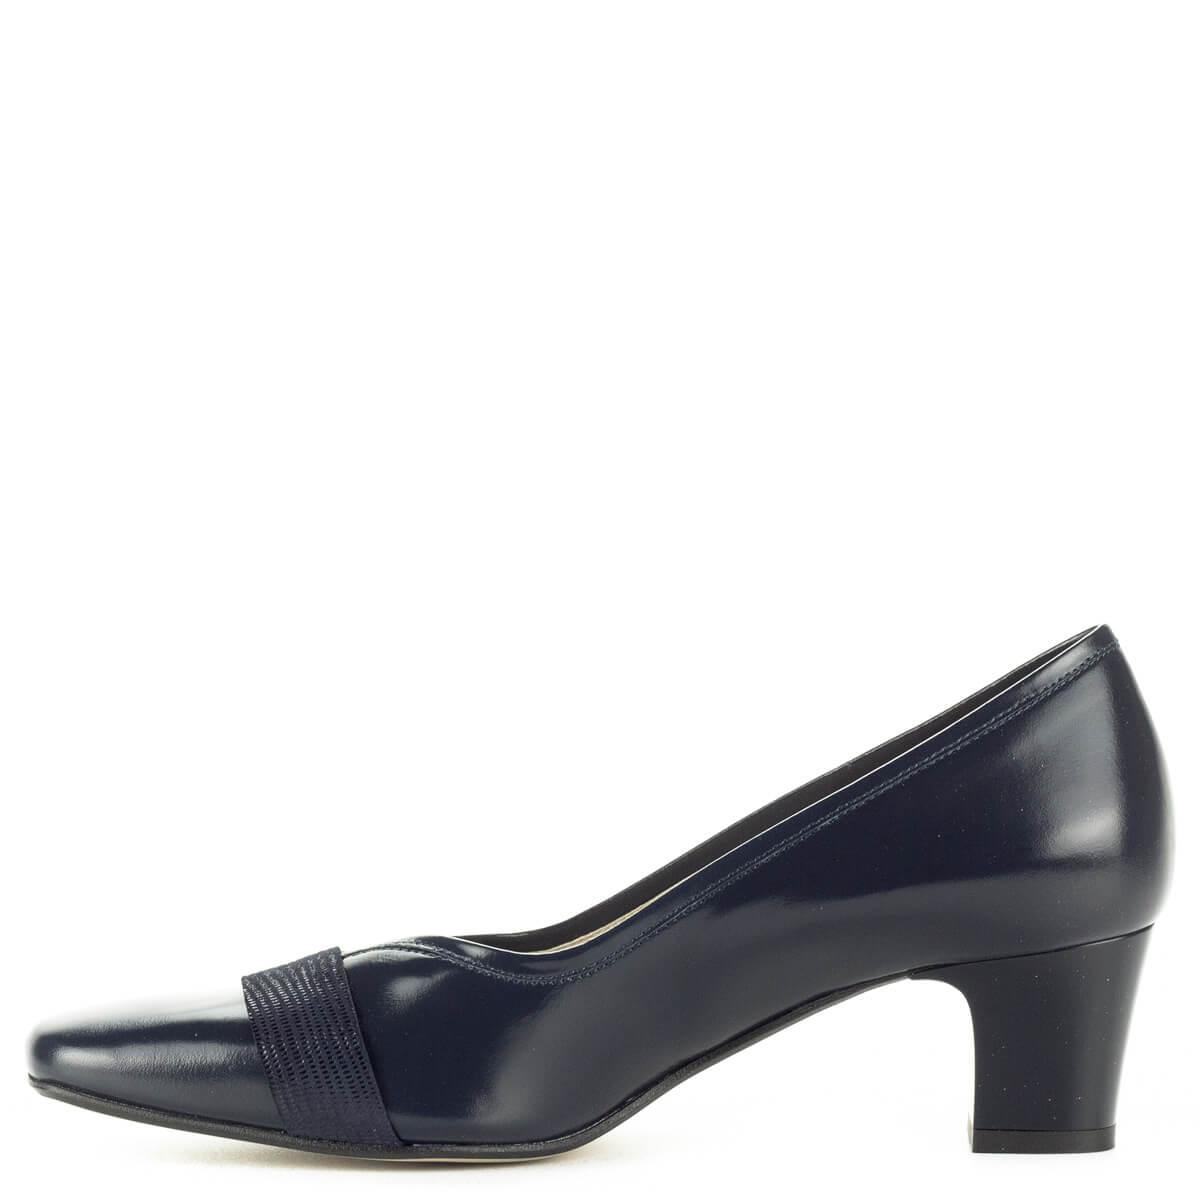 ... Anis kis sarkú kék női bőr cipő kívül-belül bőrből e194b7ad61